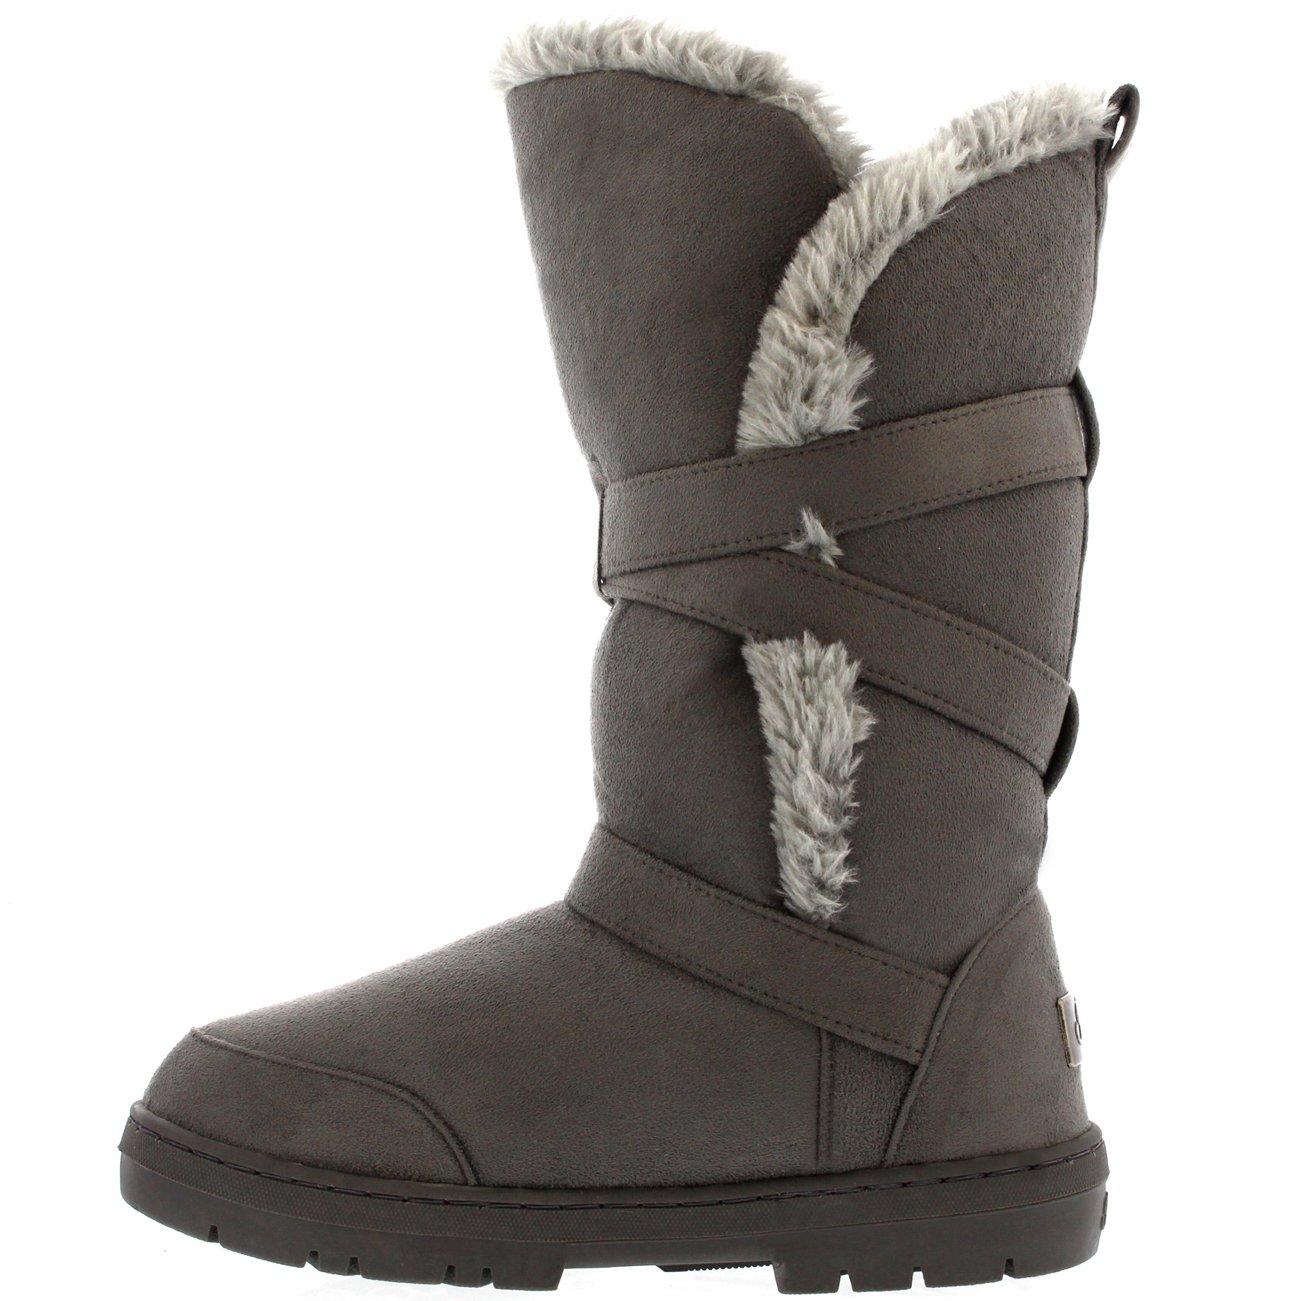 bb3eb0ef4f2456 Damen Schuhe Triplet Schnalle Fell Schnee Regen Stiefel Winter Fur Boots   Amazon.de  Schuhe   Handtaschen